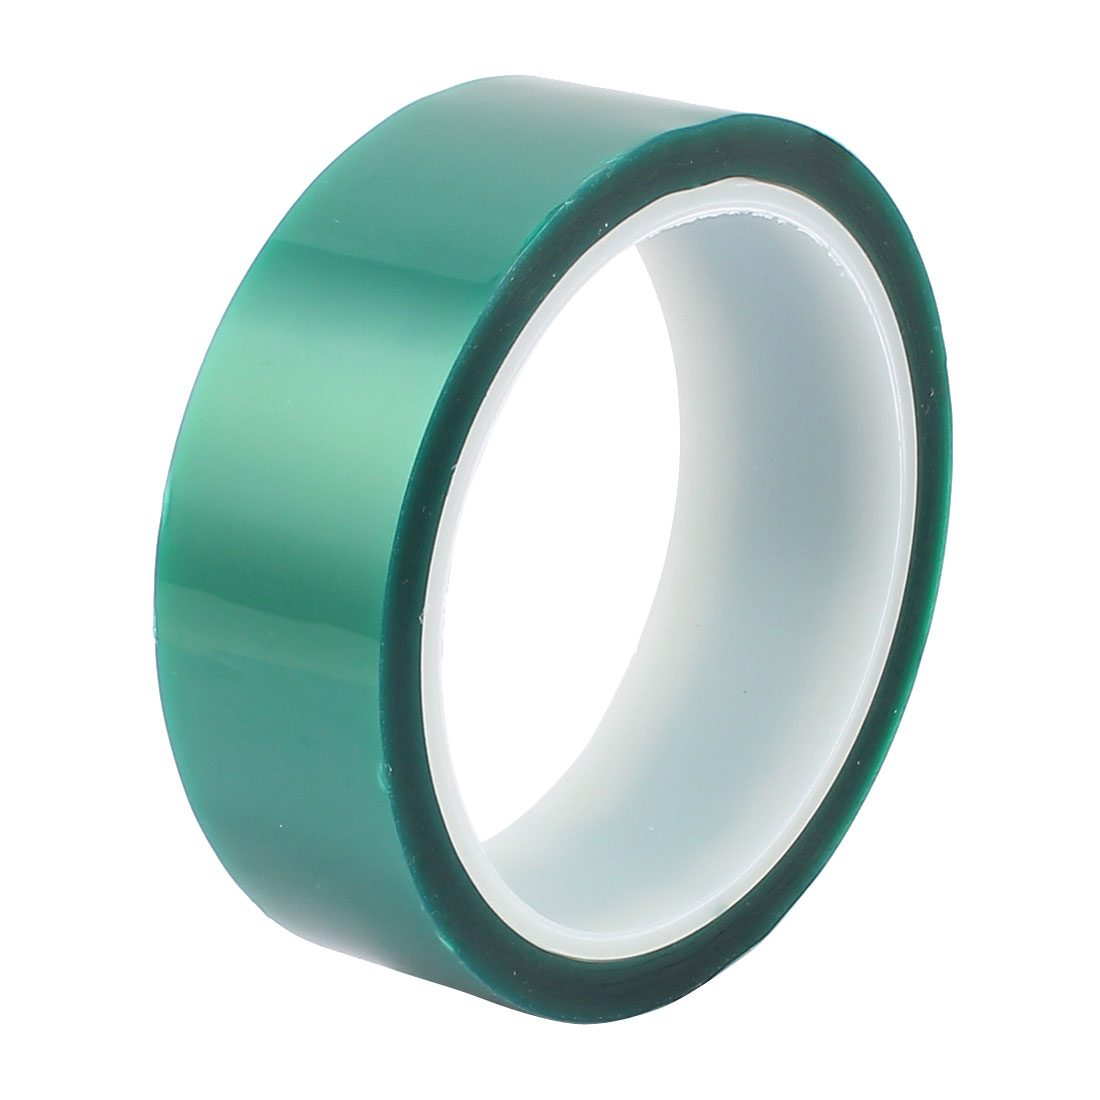 30mm Width 33M Length Green PET High Temperature Heat Resistant PCB Solder Tape